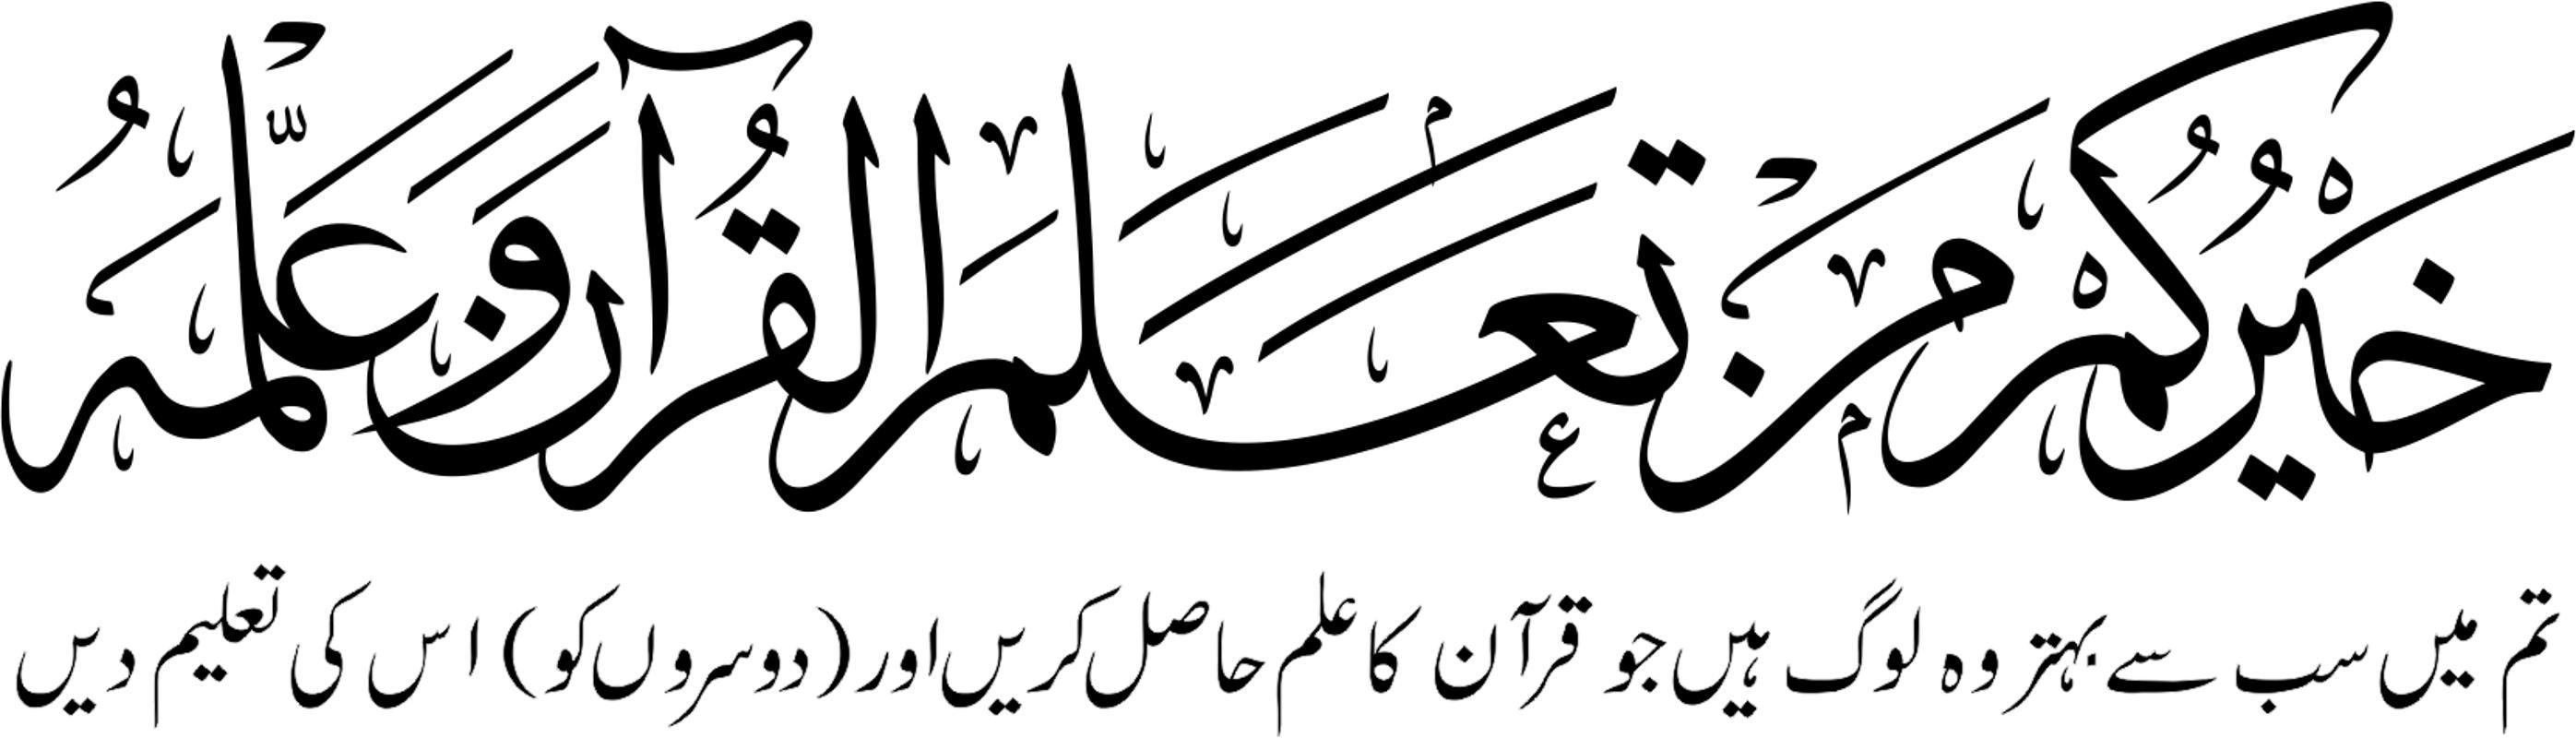 Khair-o-kum ( Quran ) Islamic Calligraphy Vector Free Vector